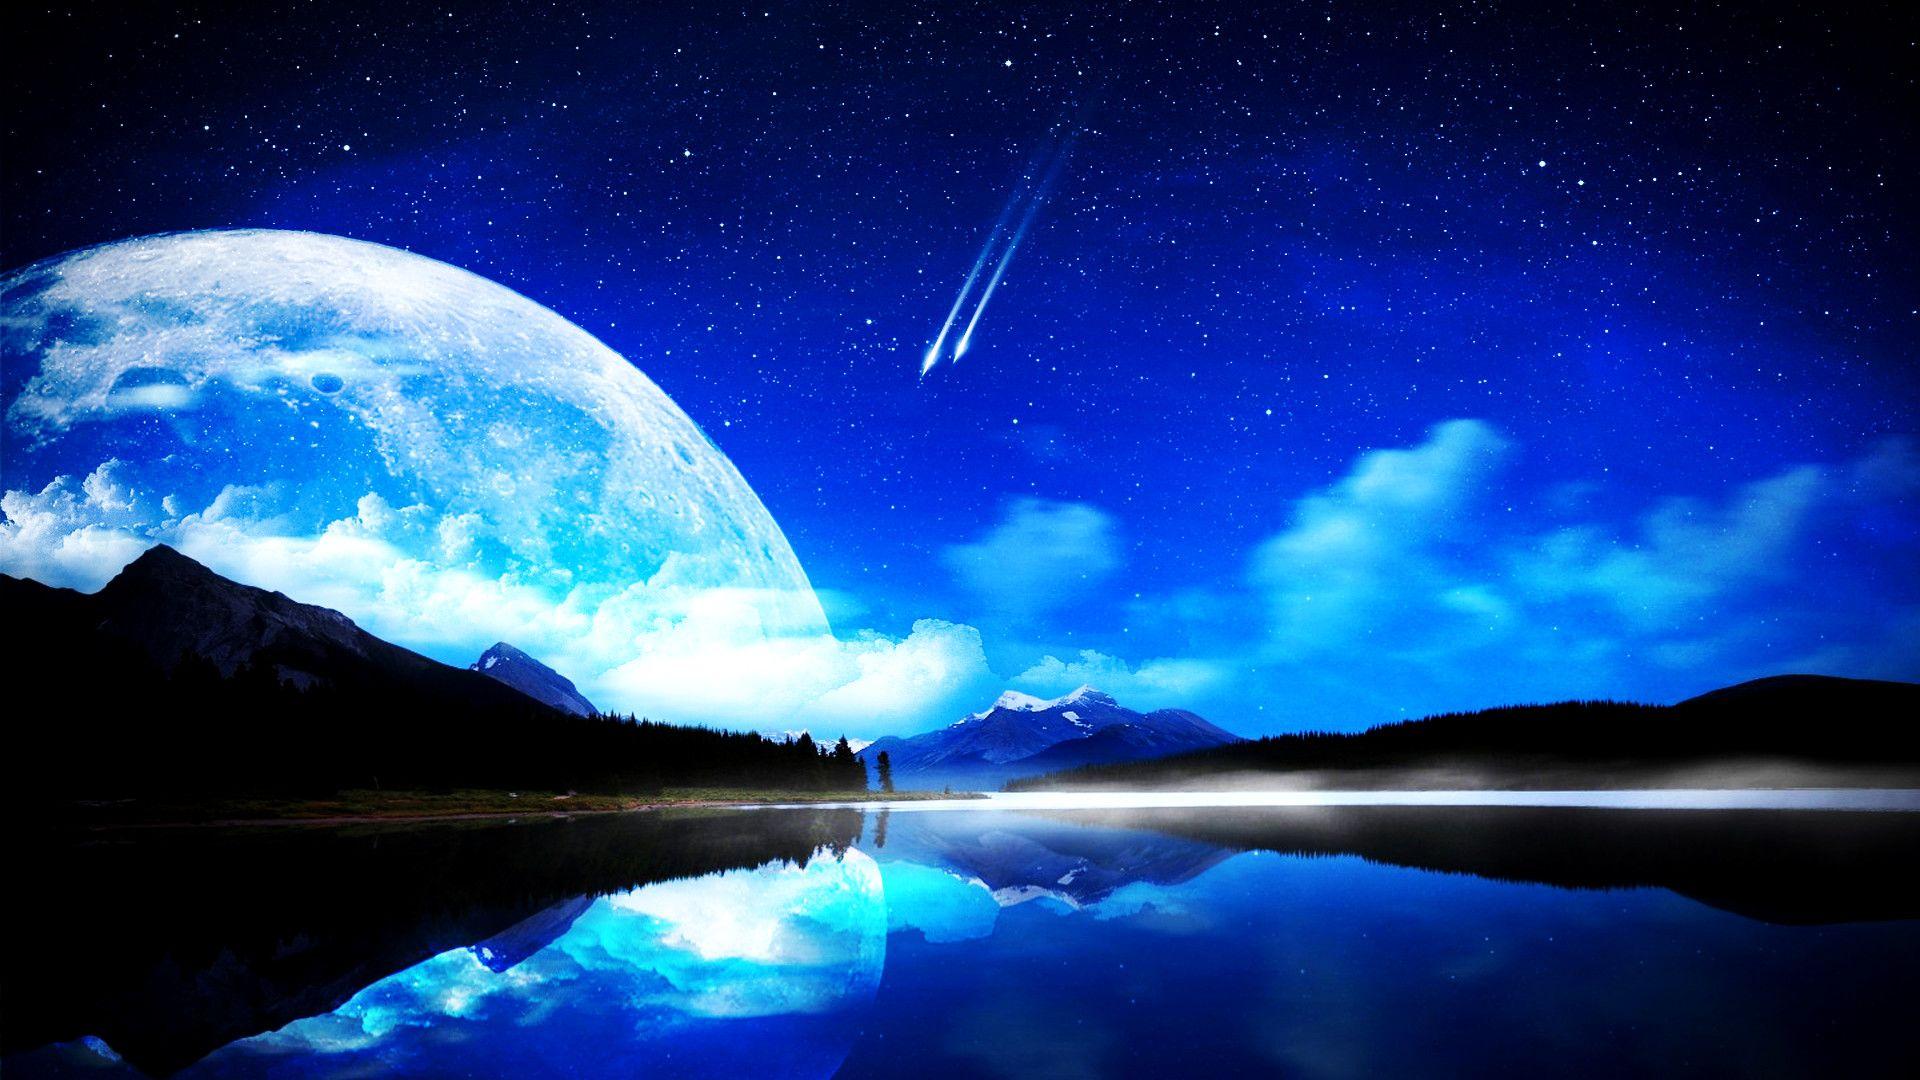 Beautiful Moon Wallpaper Hd 1920x1080 Windows 7 Best Wallpaper Hd Good Night Moon Beautiful Moon